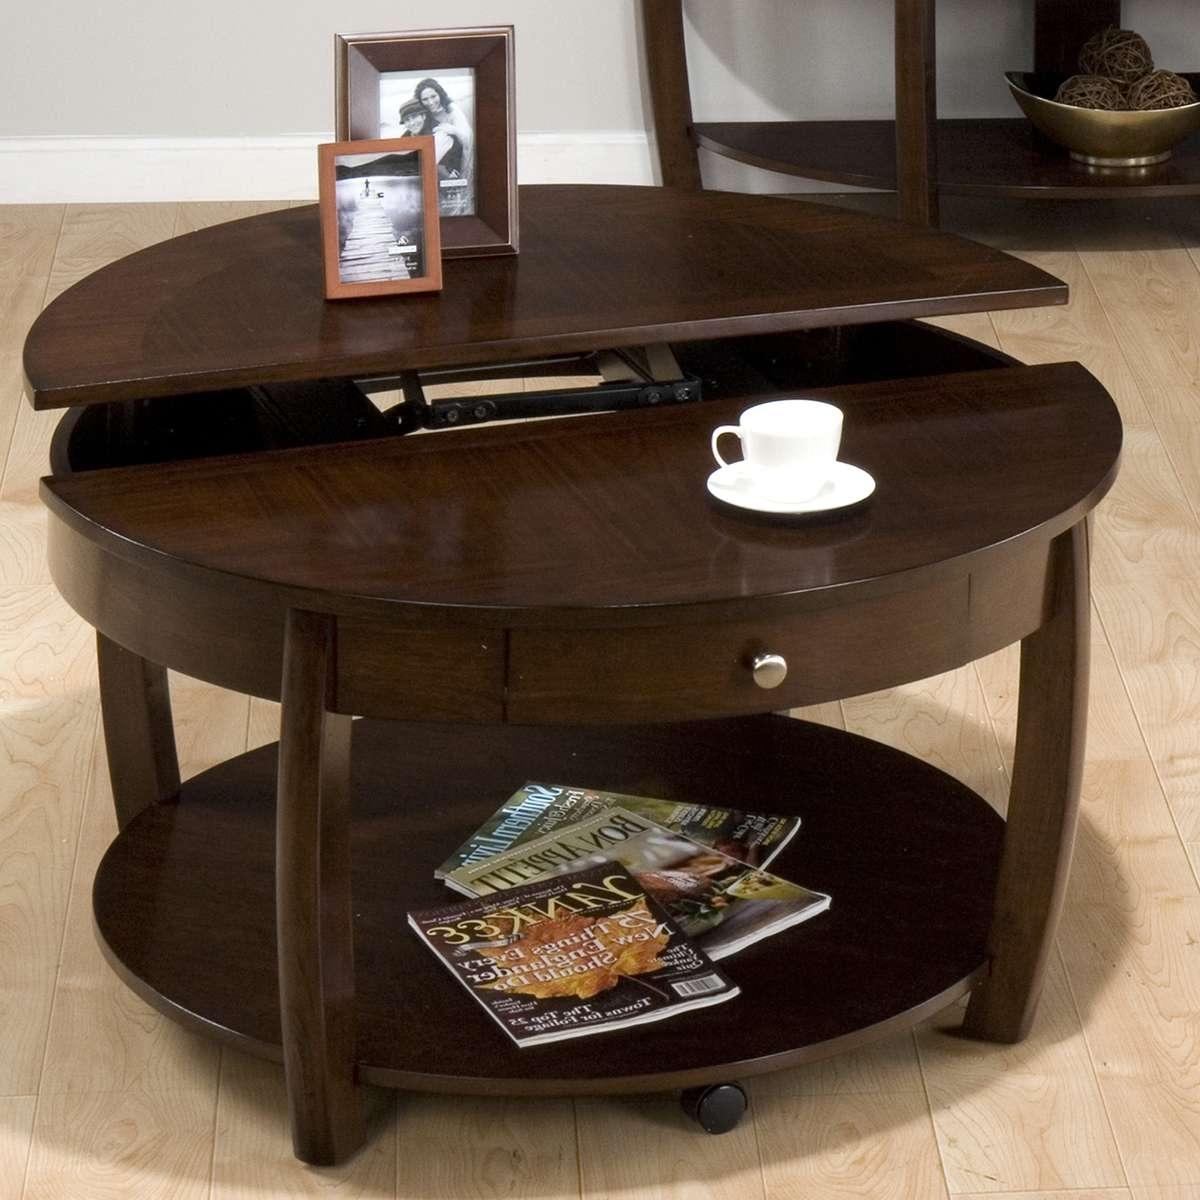 2017 Round Storage Coffee Tables Regarding Coffee Tables : Unforgettablen Storage Coffee Table Picture (View 1 of 20)